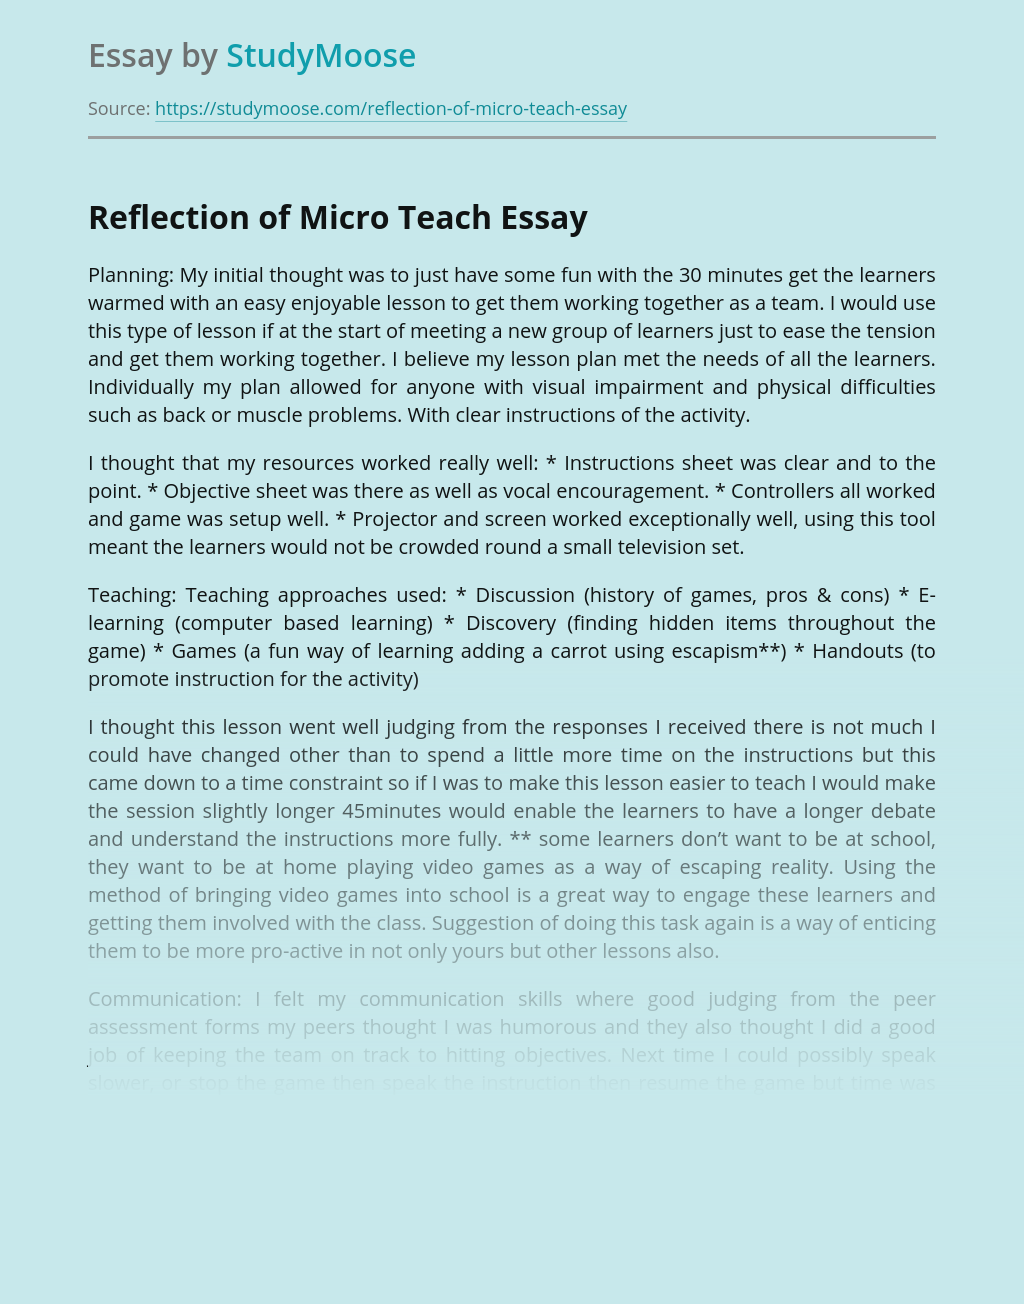 Reflection of Micro Teach